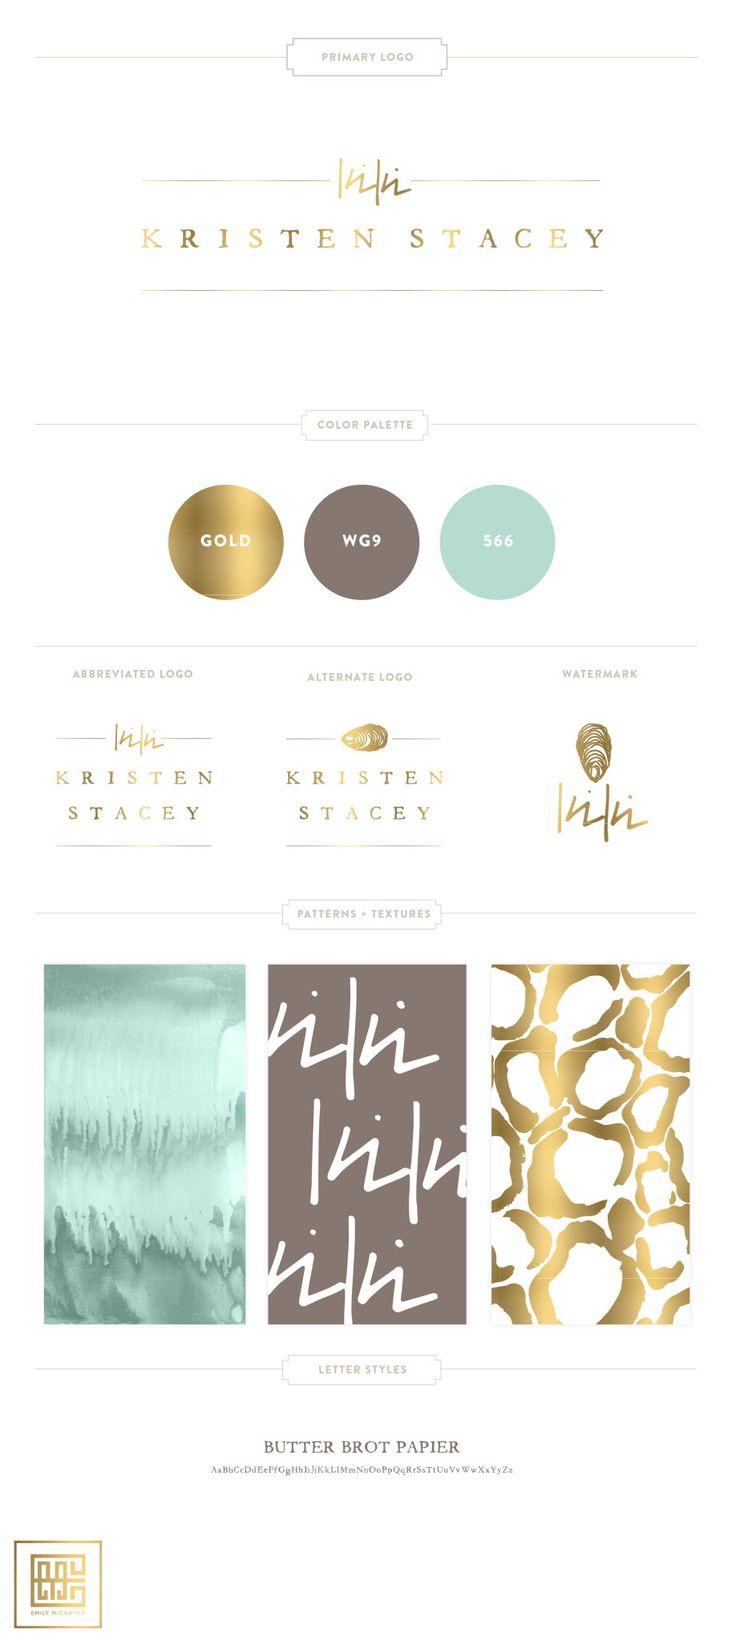 Emily McCarthy Branding Design | Kristen Stacey Branding Board